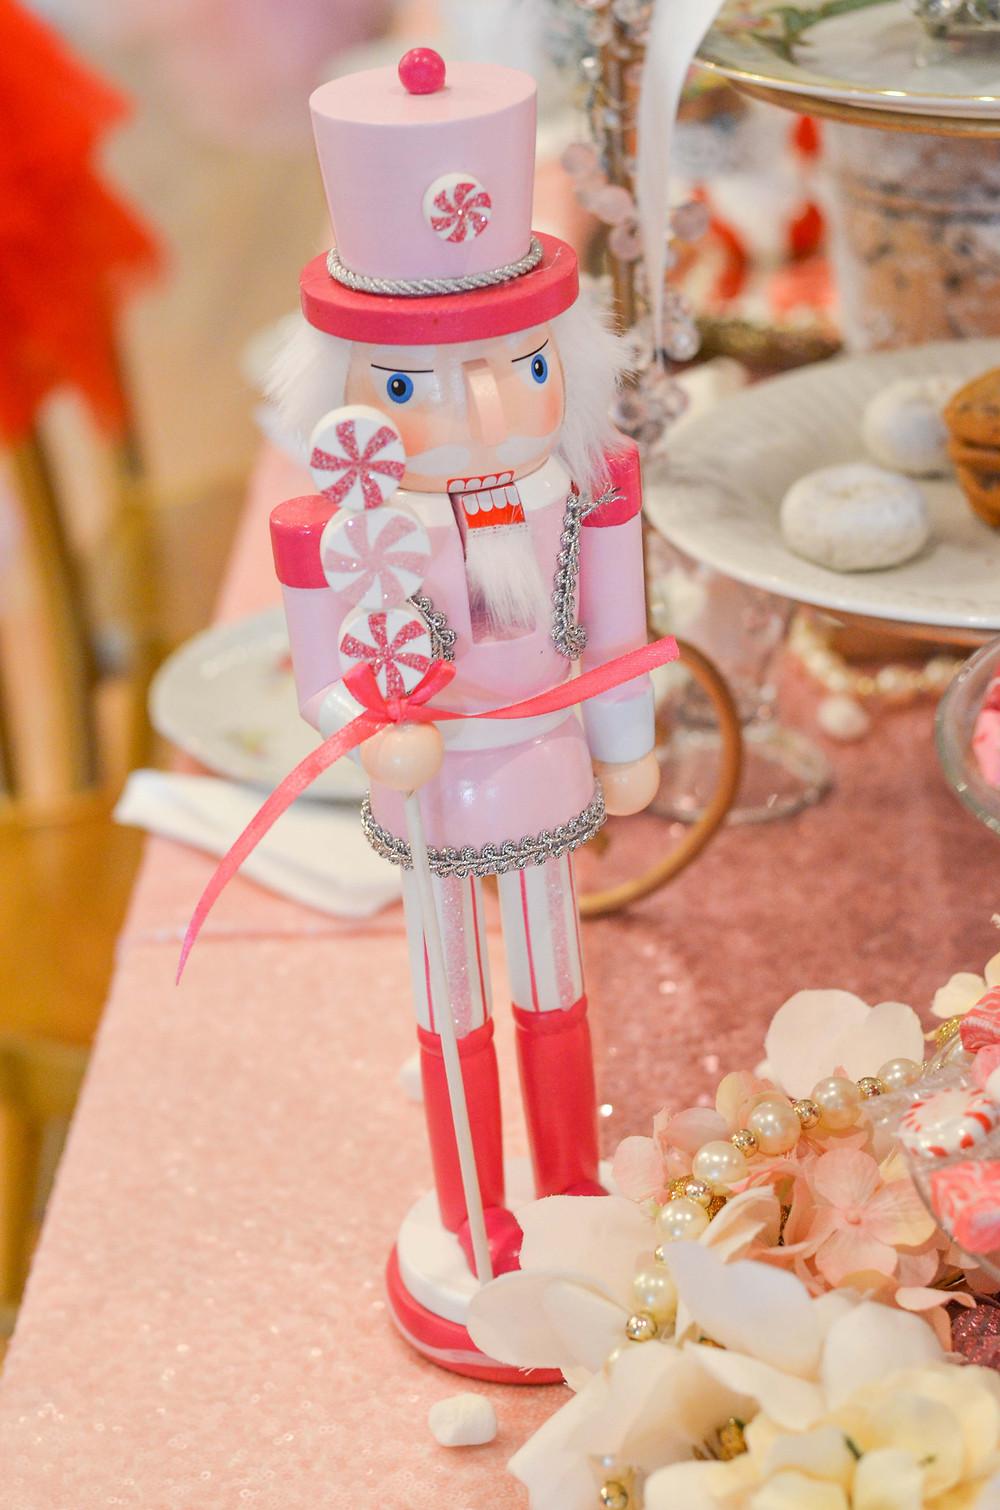 pink nutcracker detail for tea party theme